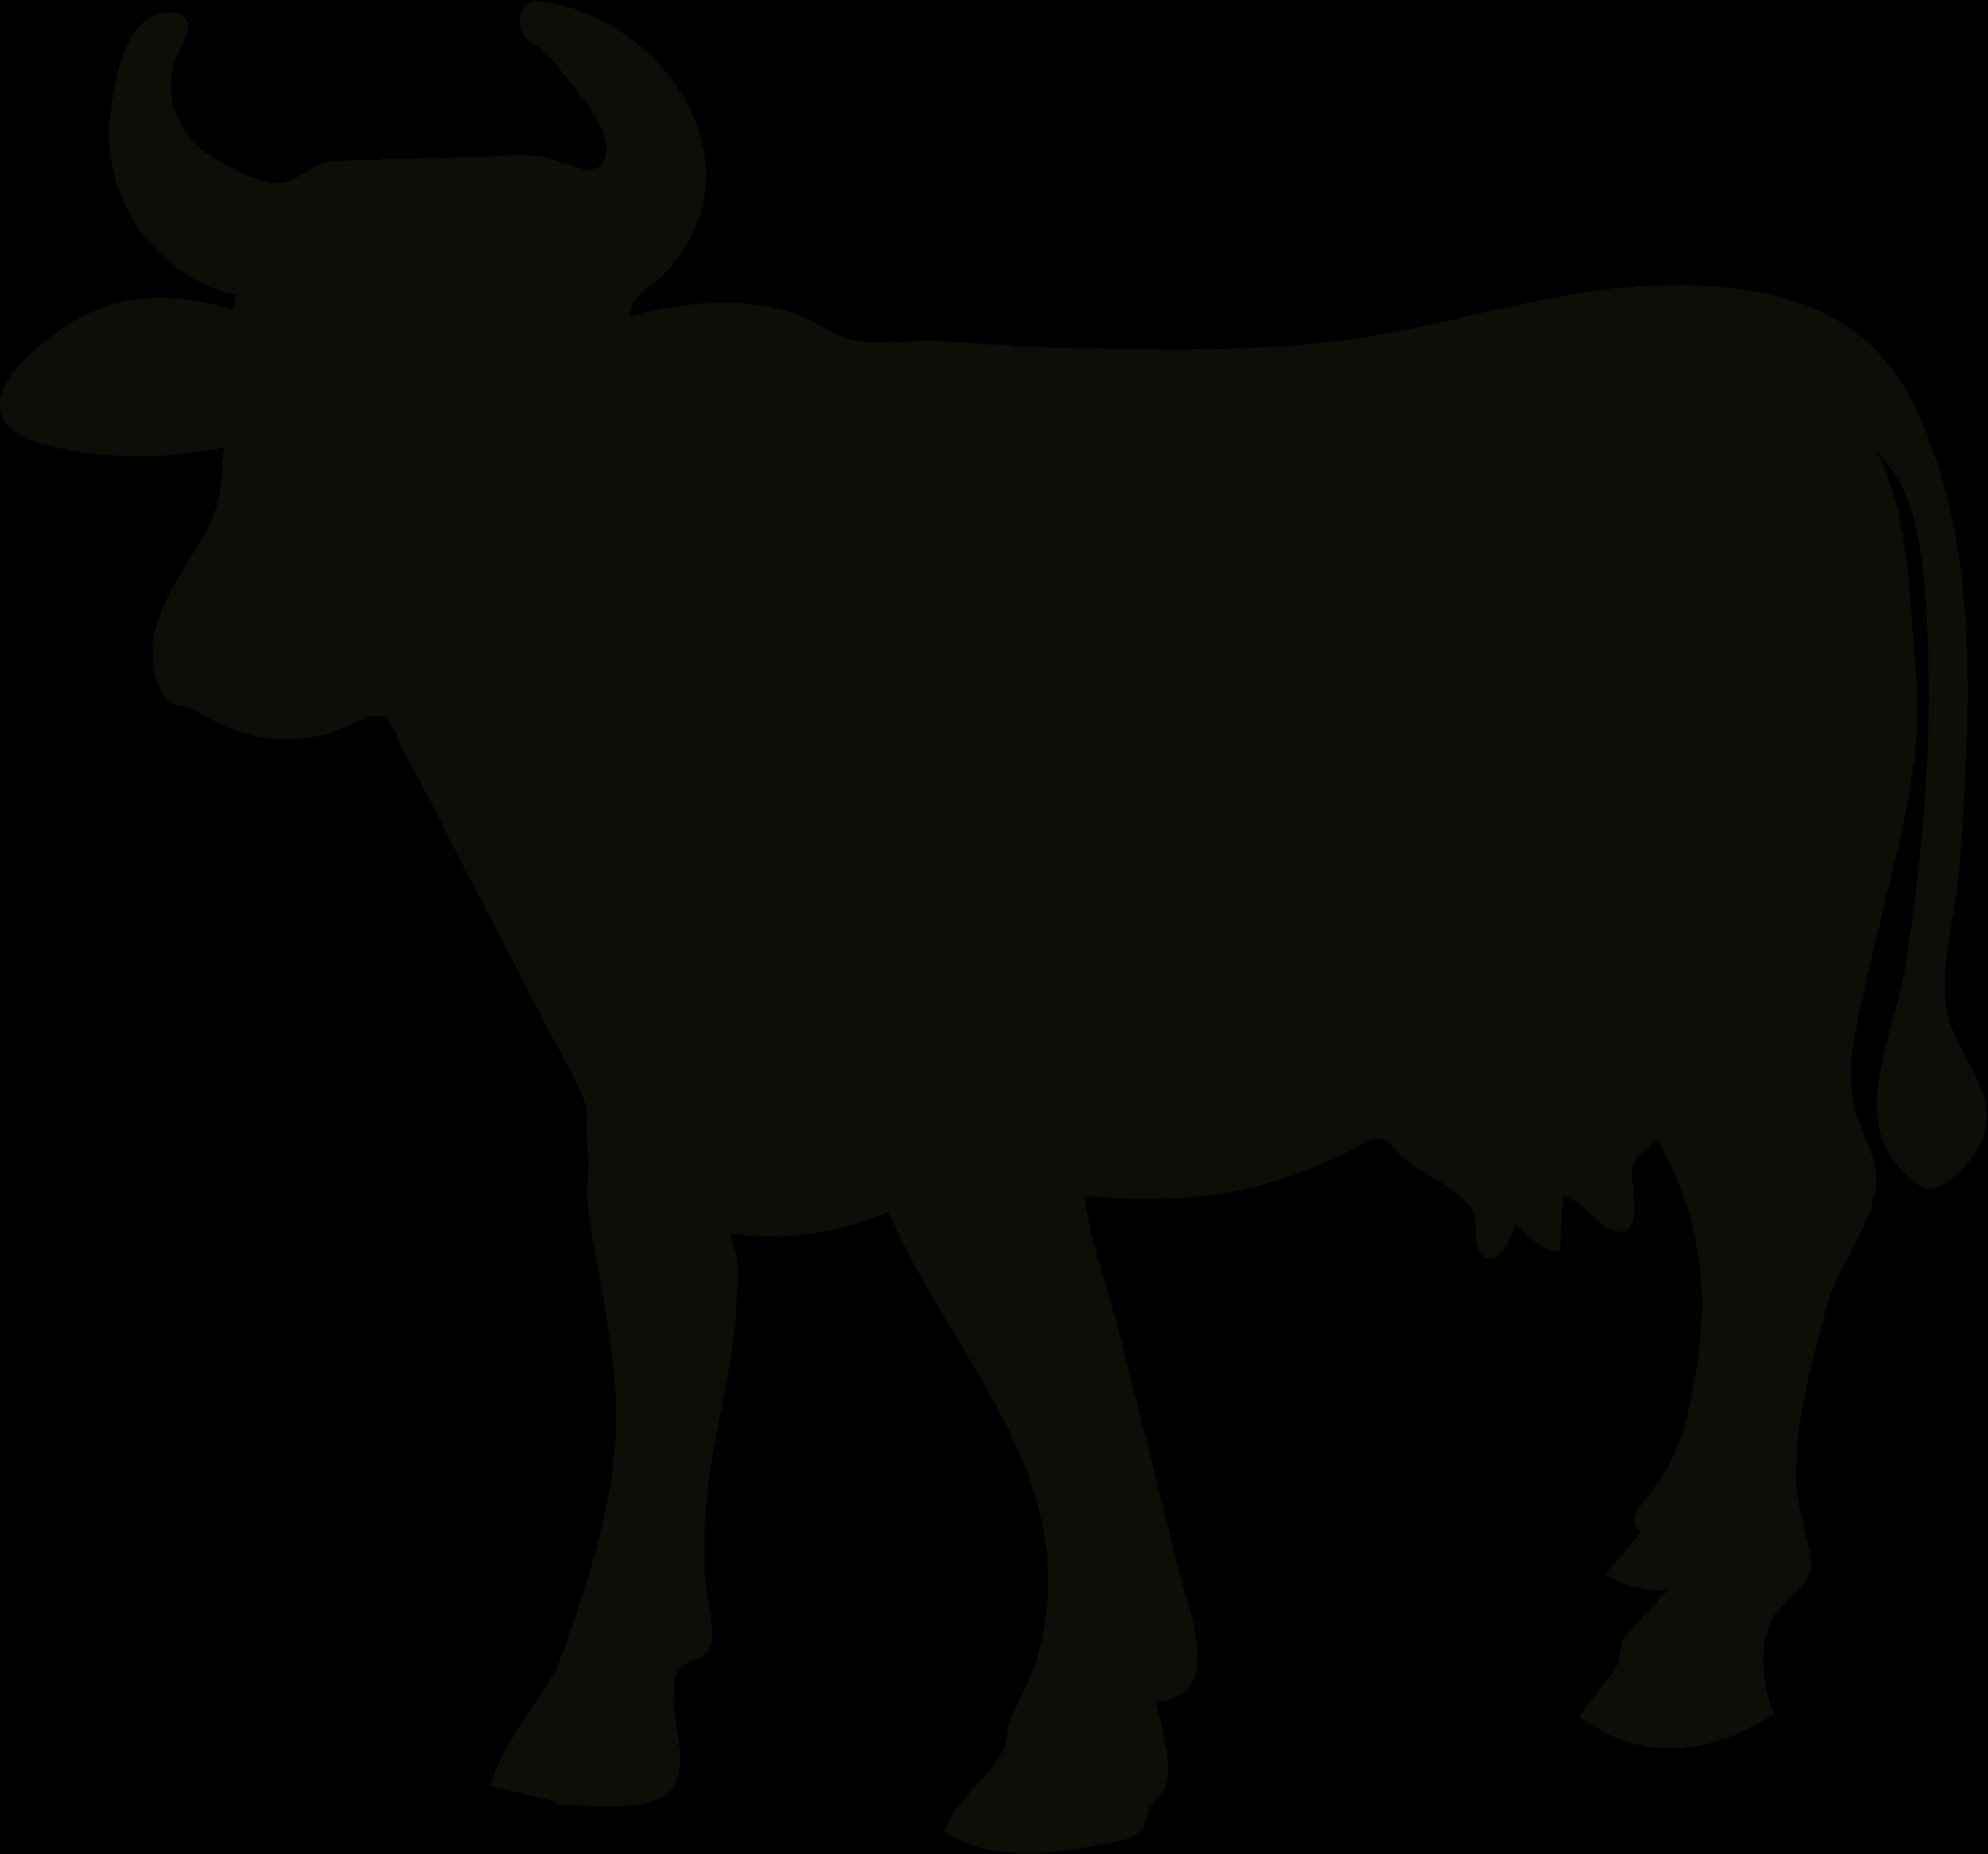 Cattle clip art vector. Cow clipart profile